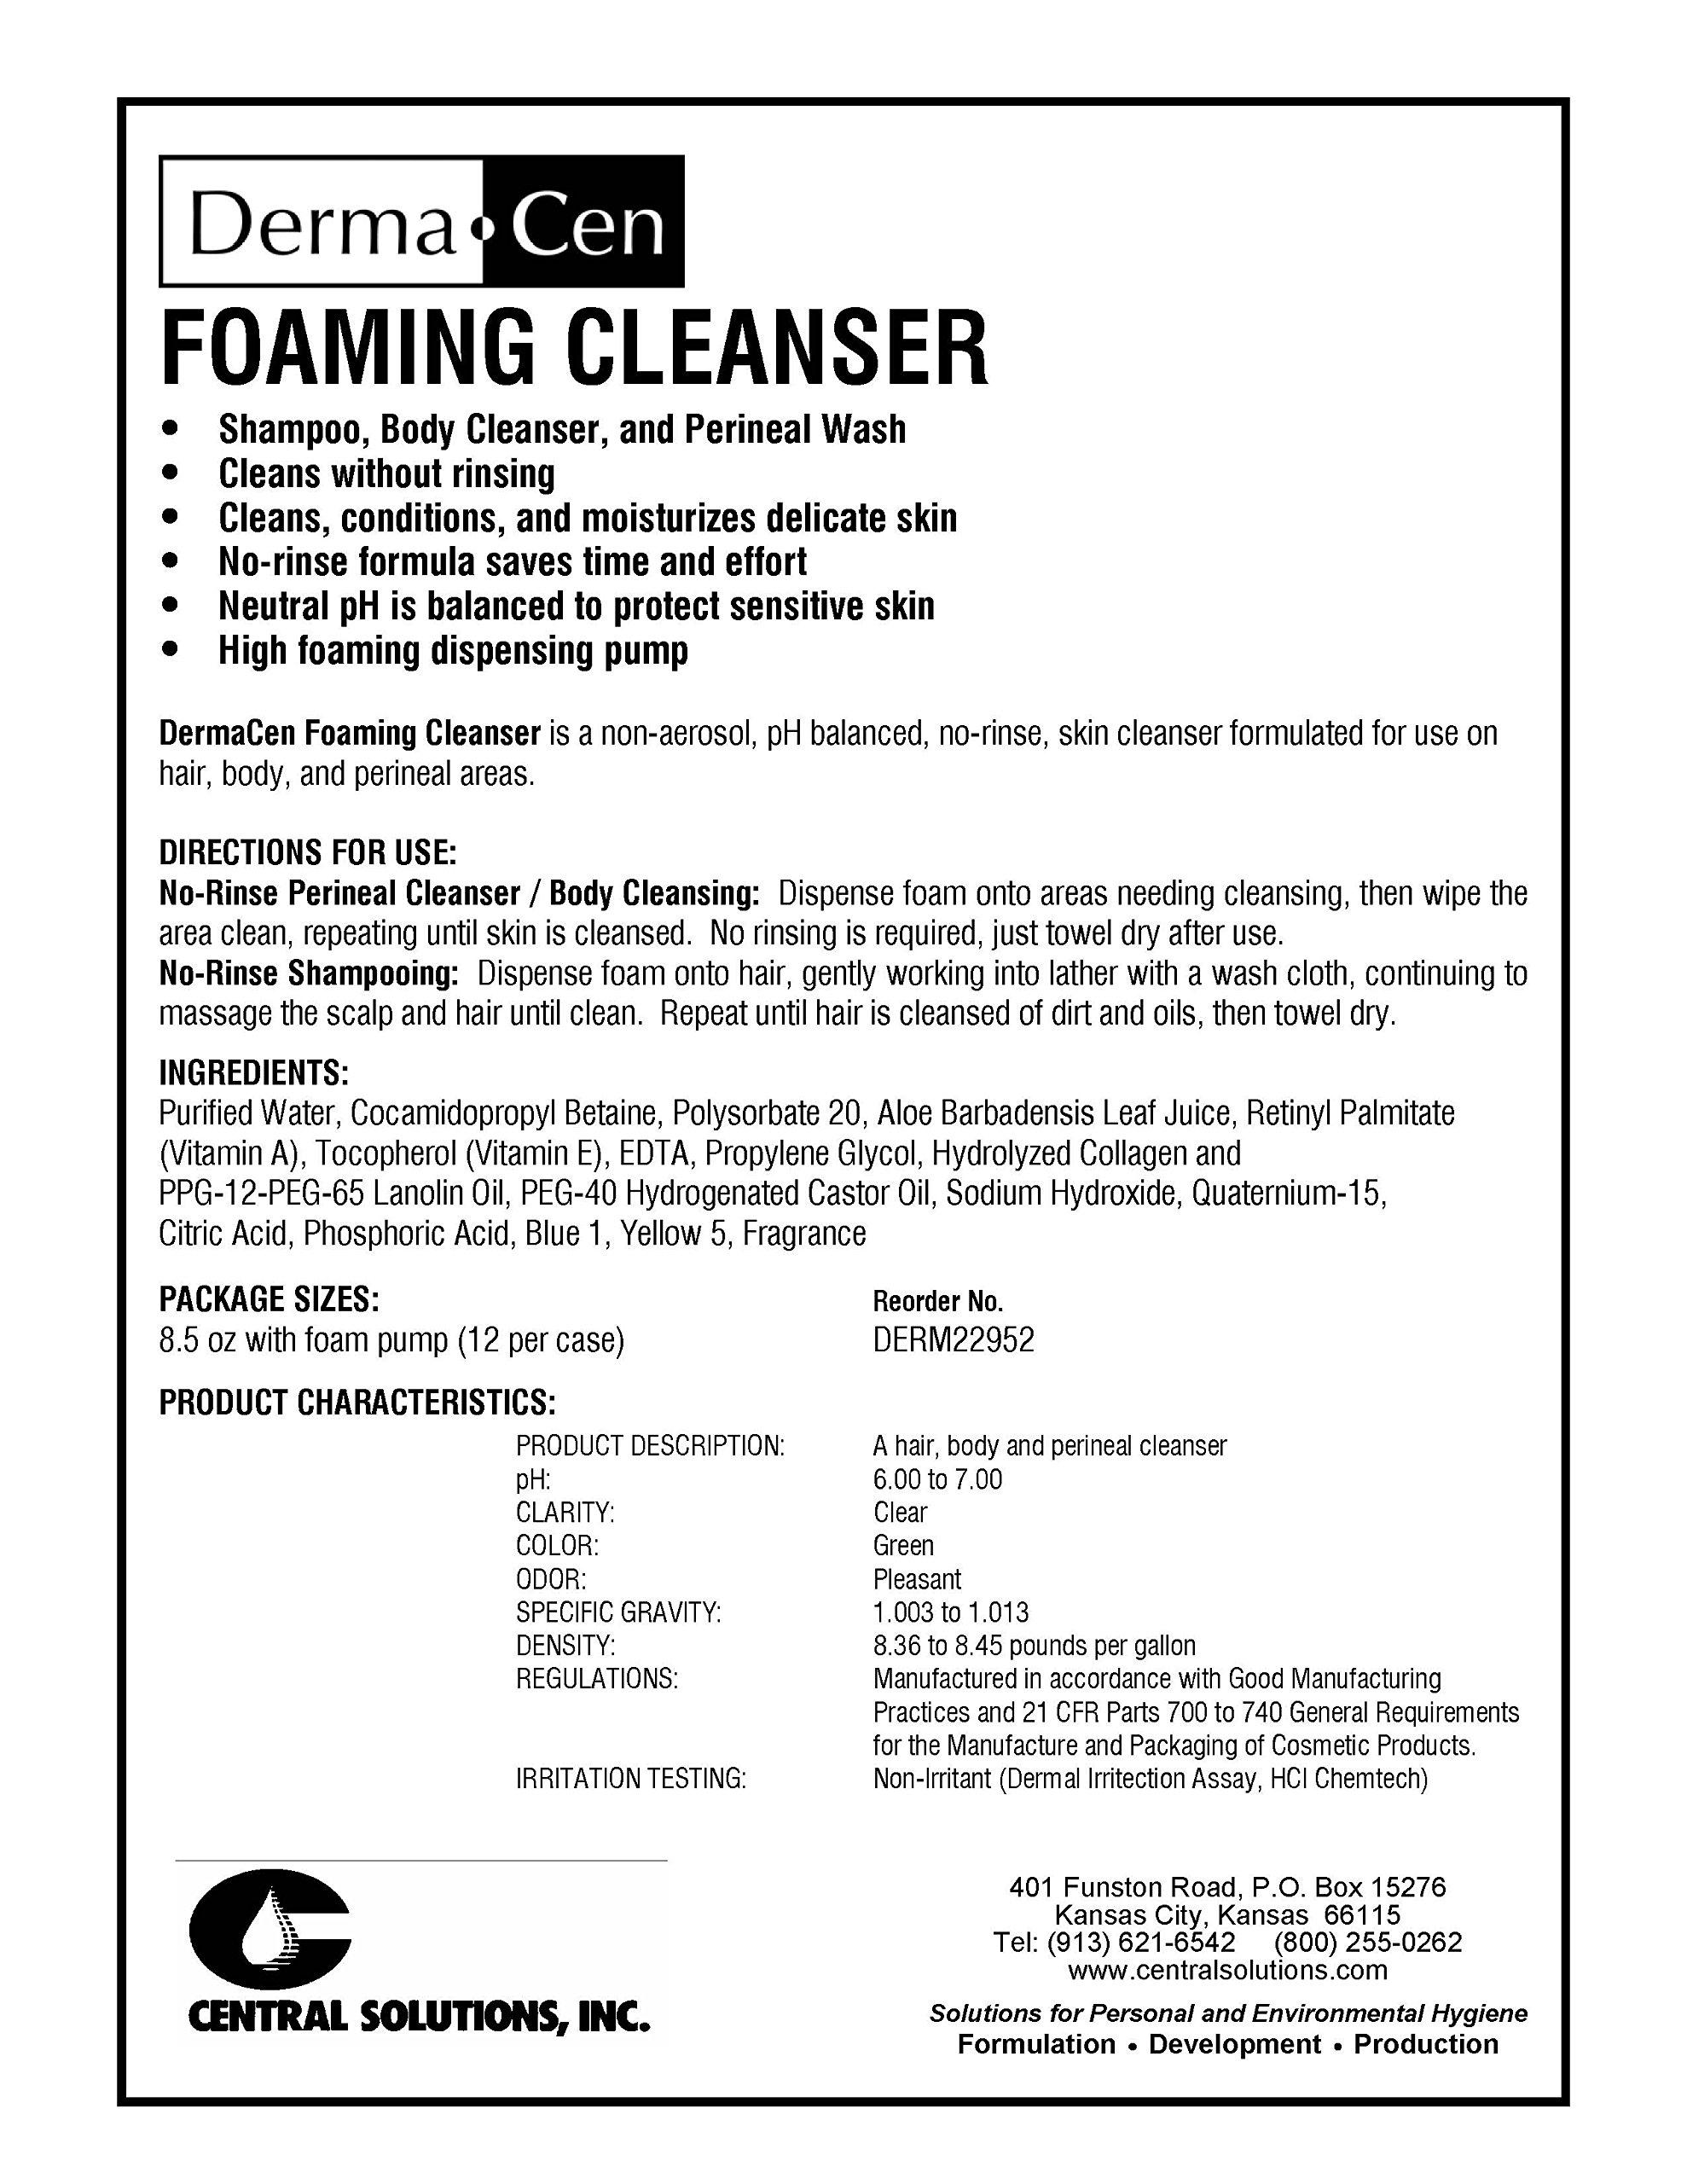 DermaCen No-Rinse Foaming Cleanser 8.5 oz Pump Bottles Model#DERM22952 - 1/Case of 12